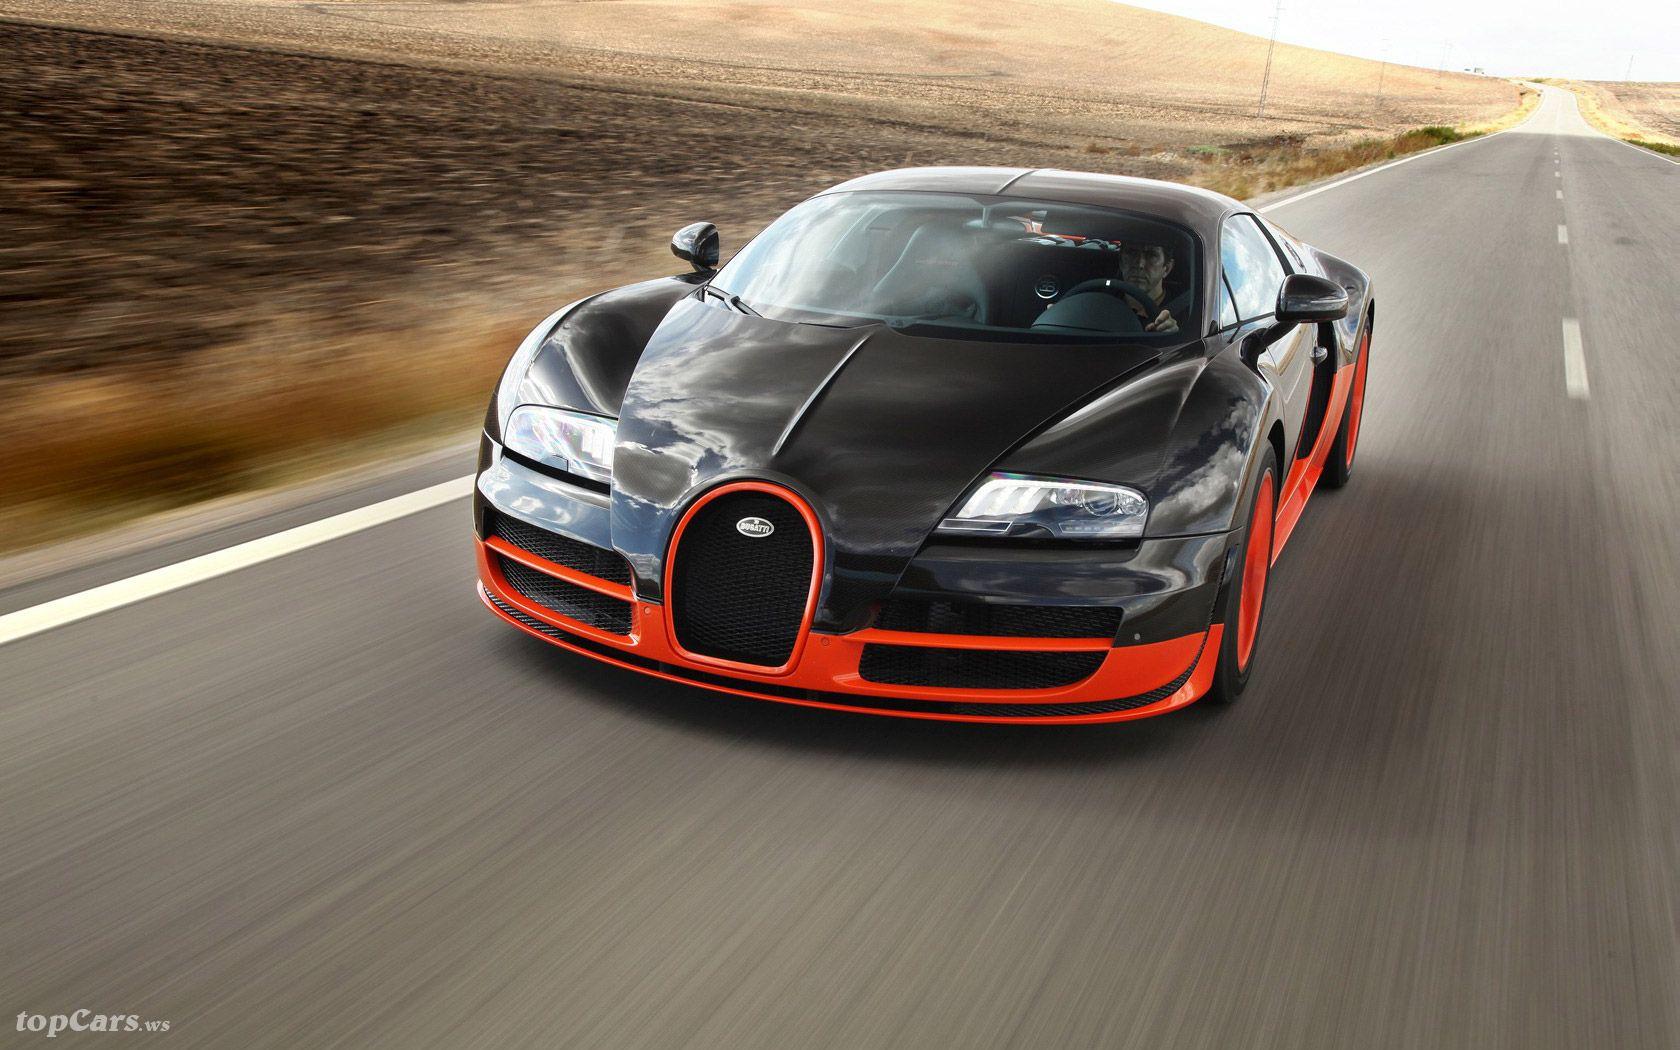 Bugatti Veyron Super Sport Fastest Car In The World Bugatti Veyron Super Sport Bugatti Veyron Bugatti Cars